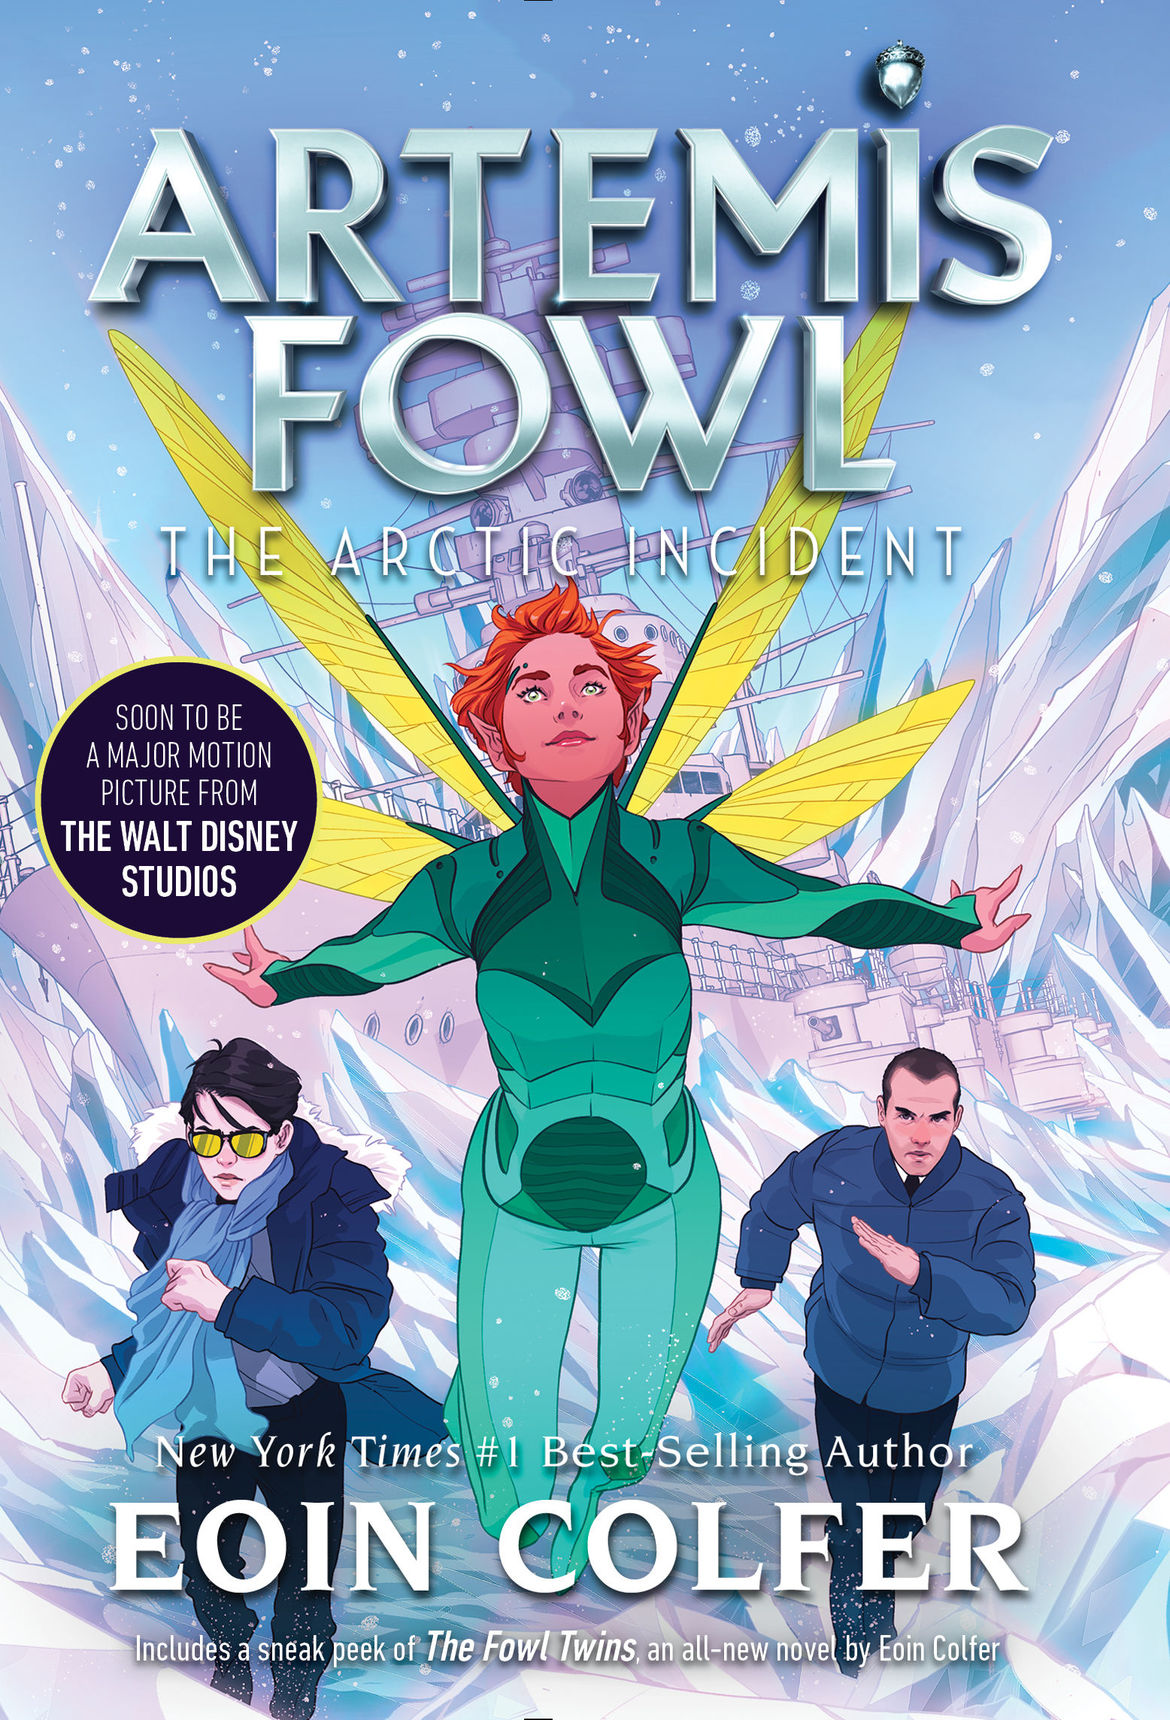 Artemis Fowl 2 Arctic Incident repackage